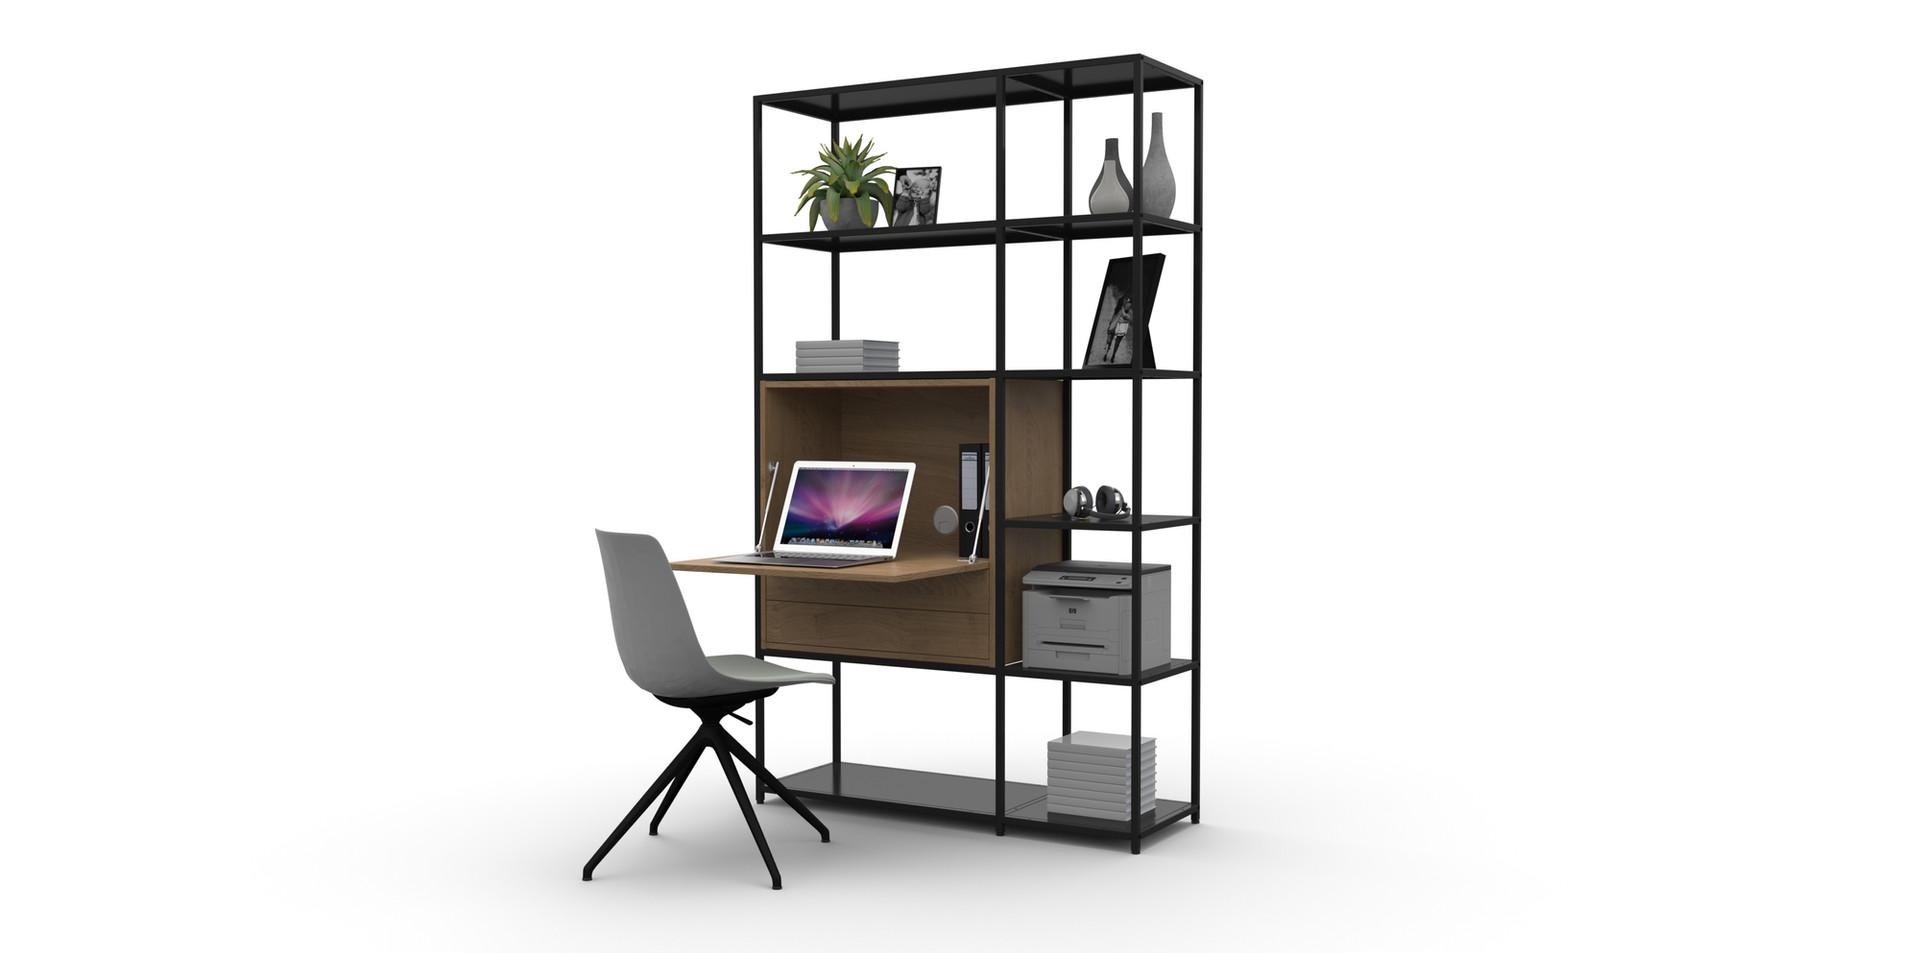 820 x 2055h Shelf Unit with Desk Insert_